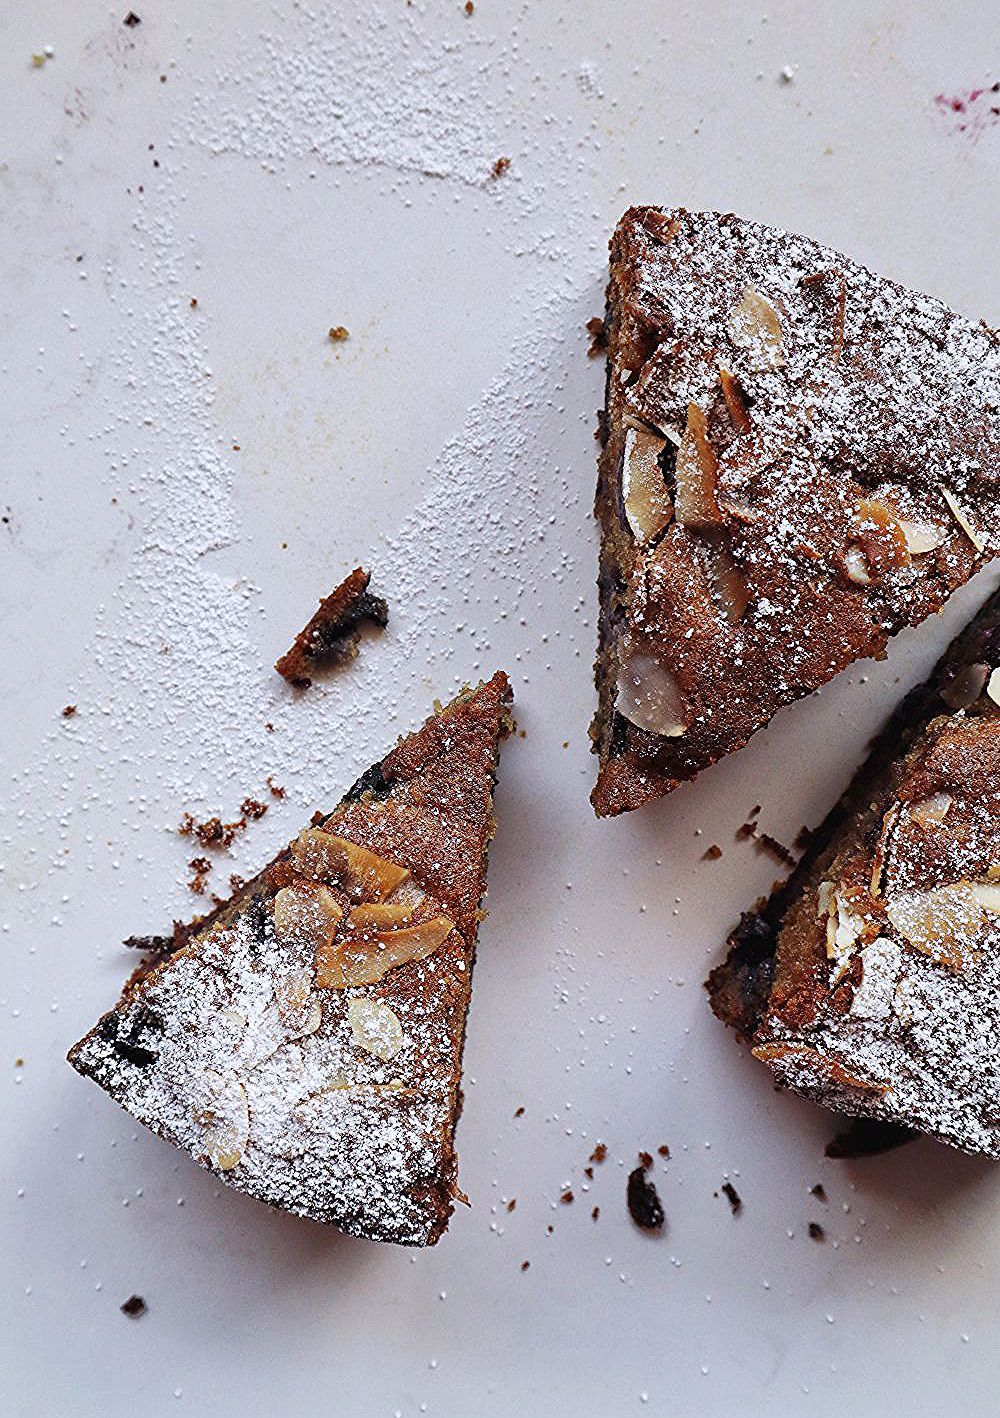 Blueberry Coconut Almond Cake Buttermilk Pantry In 2020 Almond Cakes Coconut Almond Tea Cakes